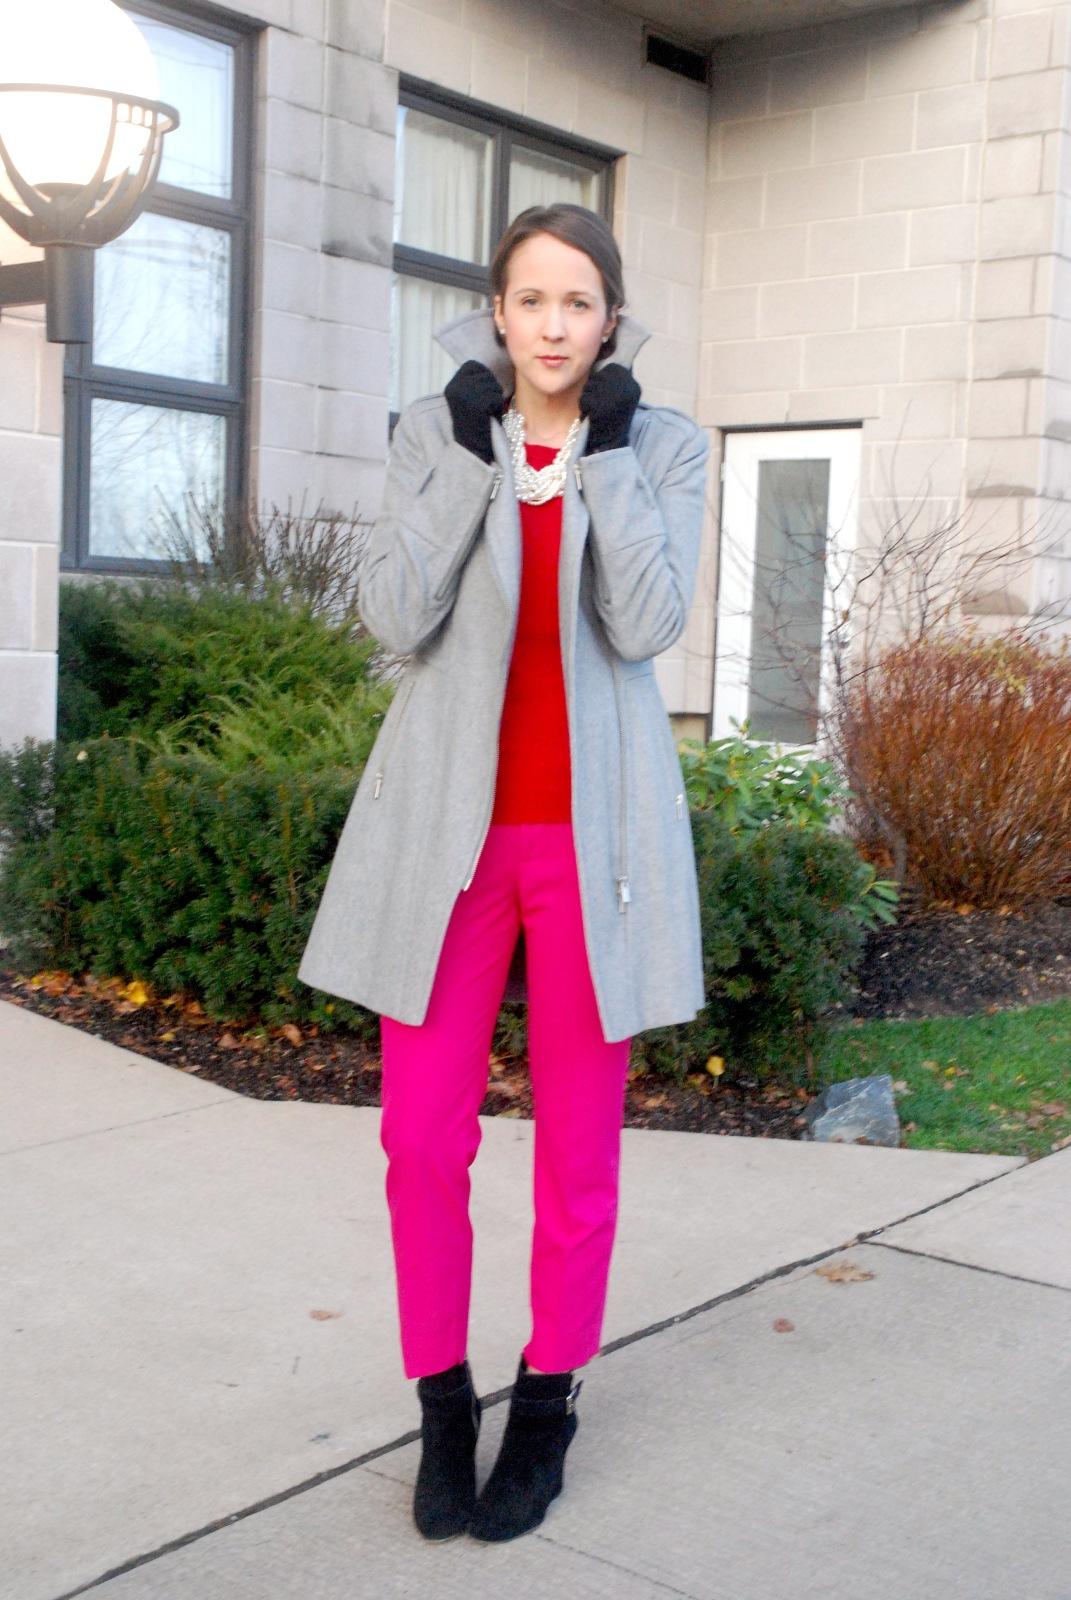 Ankle Boots, Zara Trousers, Gray Outerwear, Zara, Zara, Zara